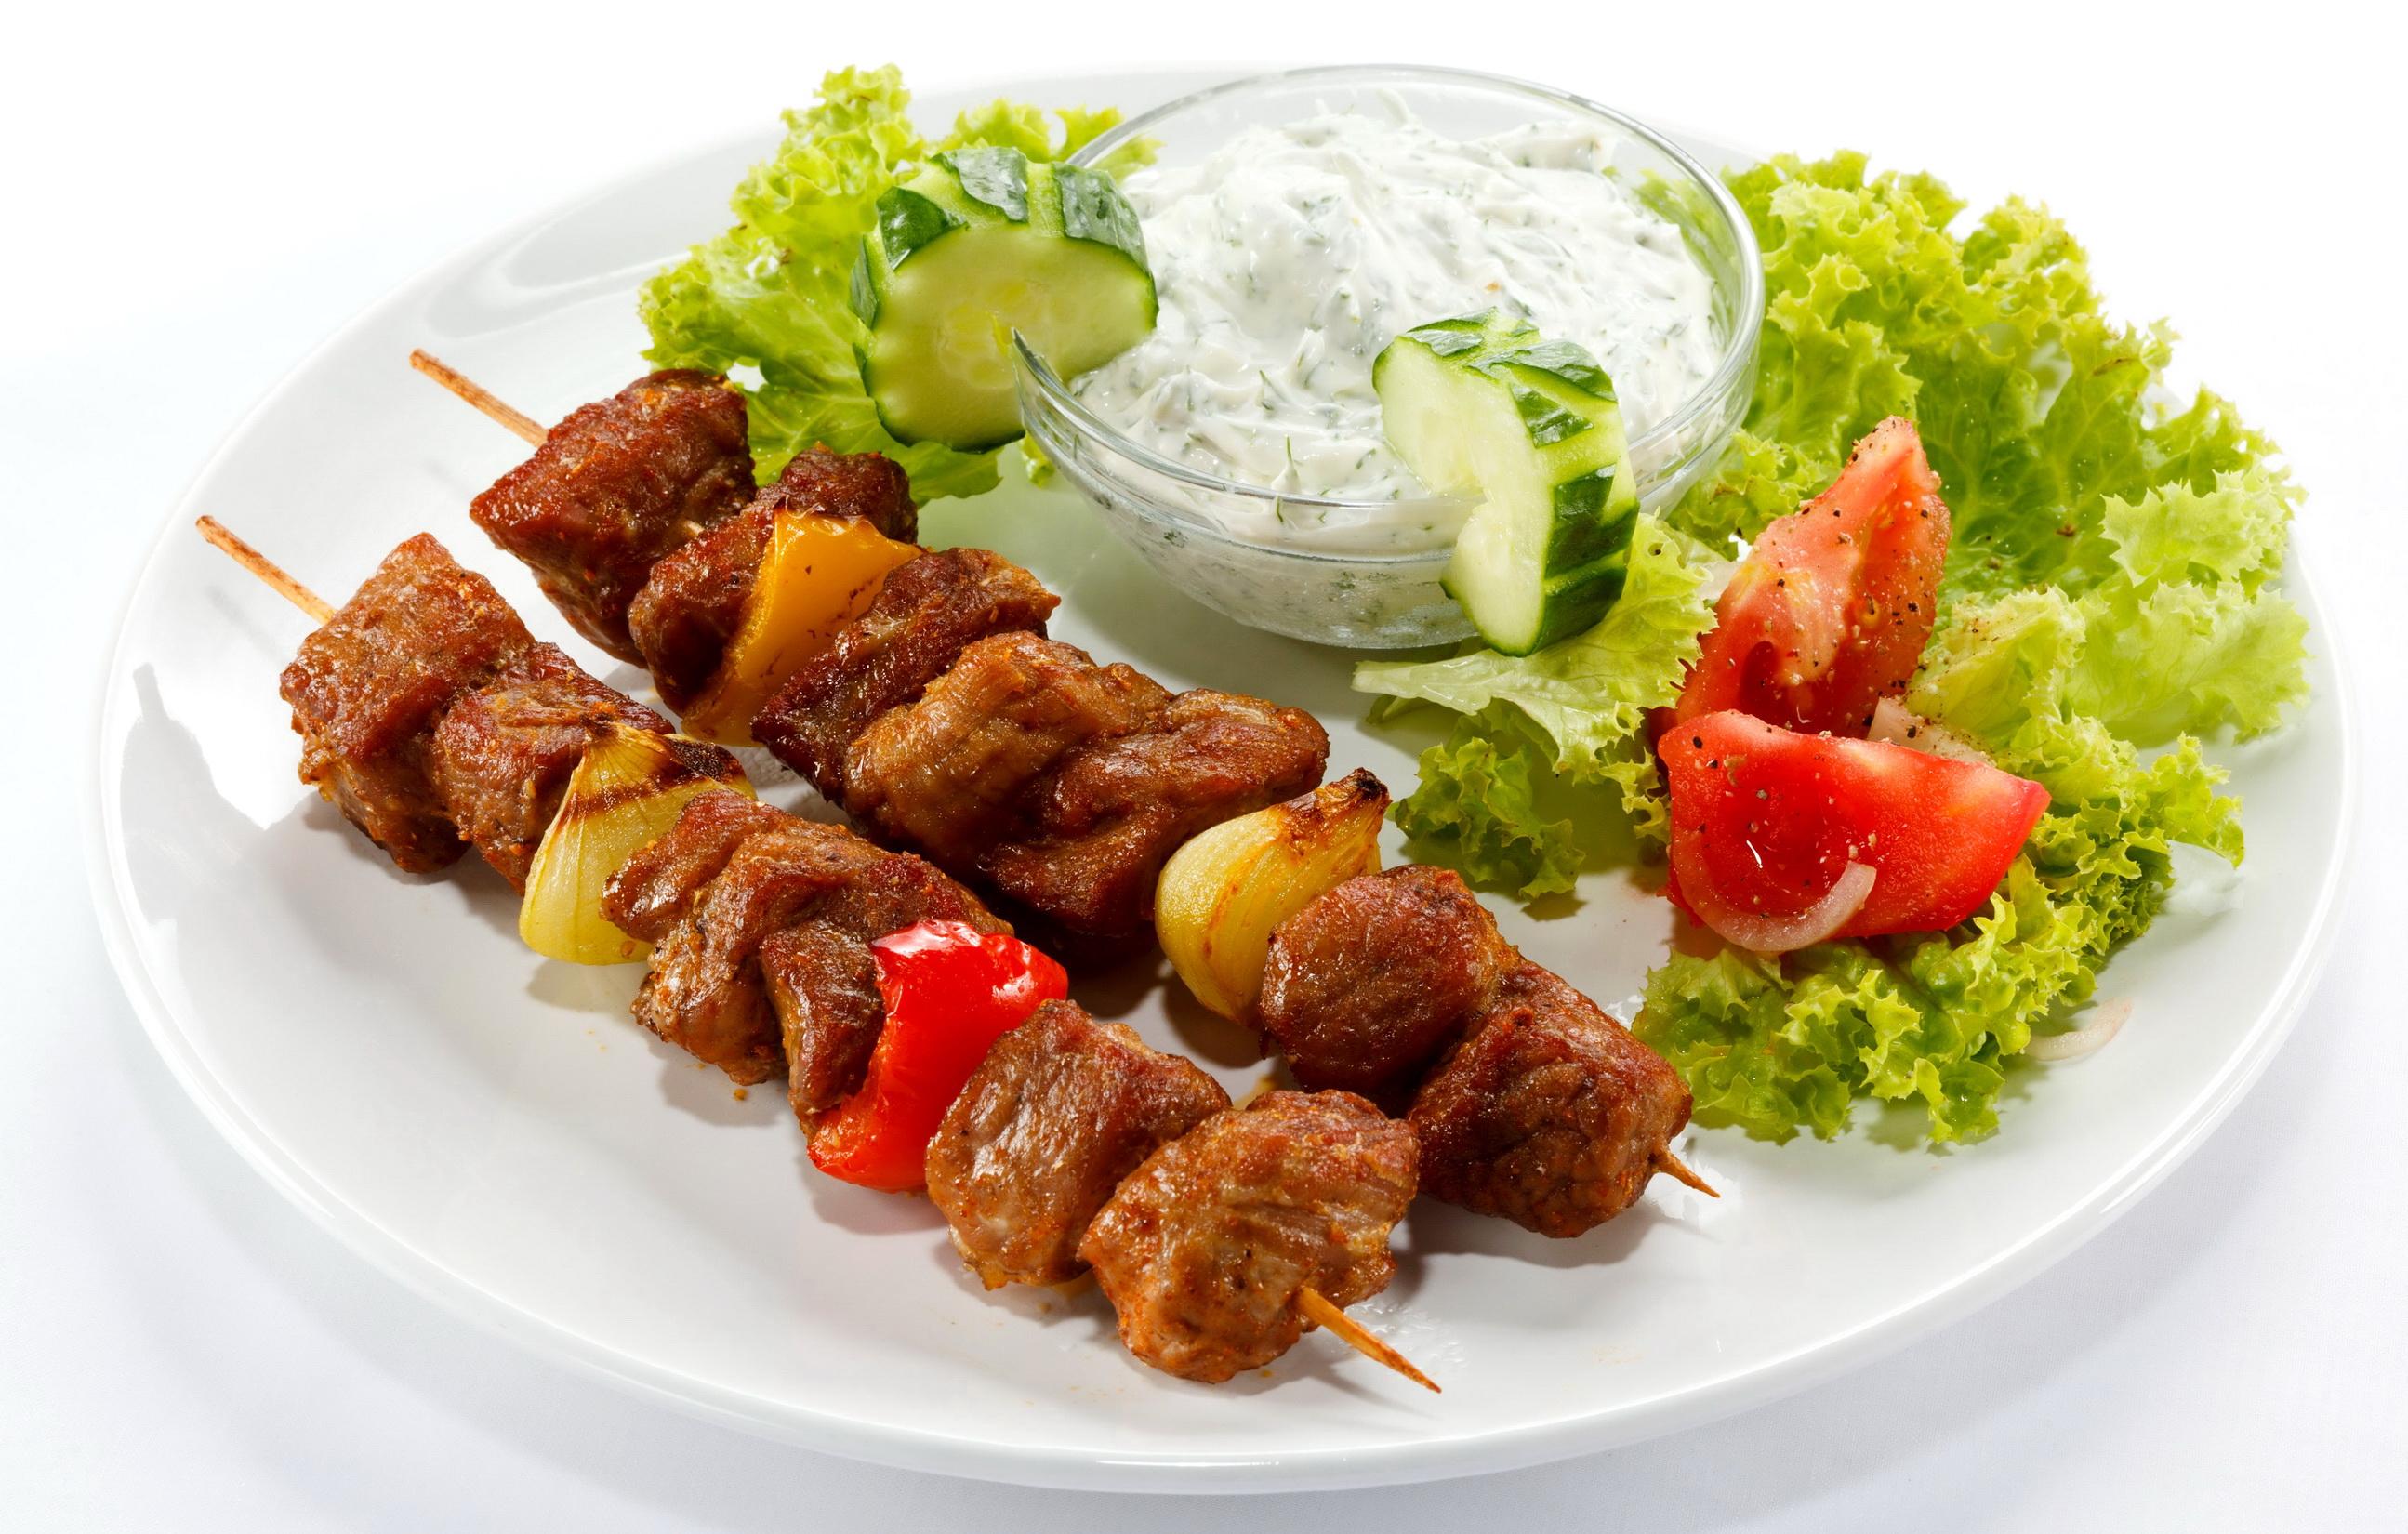 еда салаты рыба курица банкет  № 2124090 загрузить